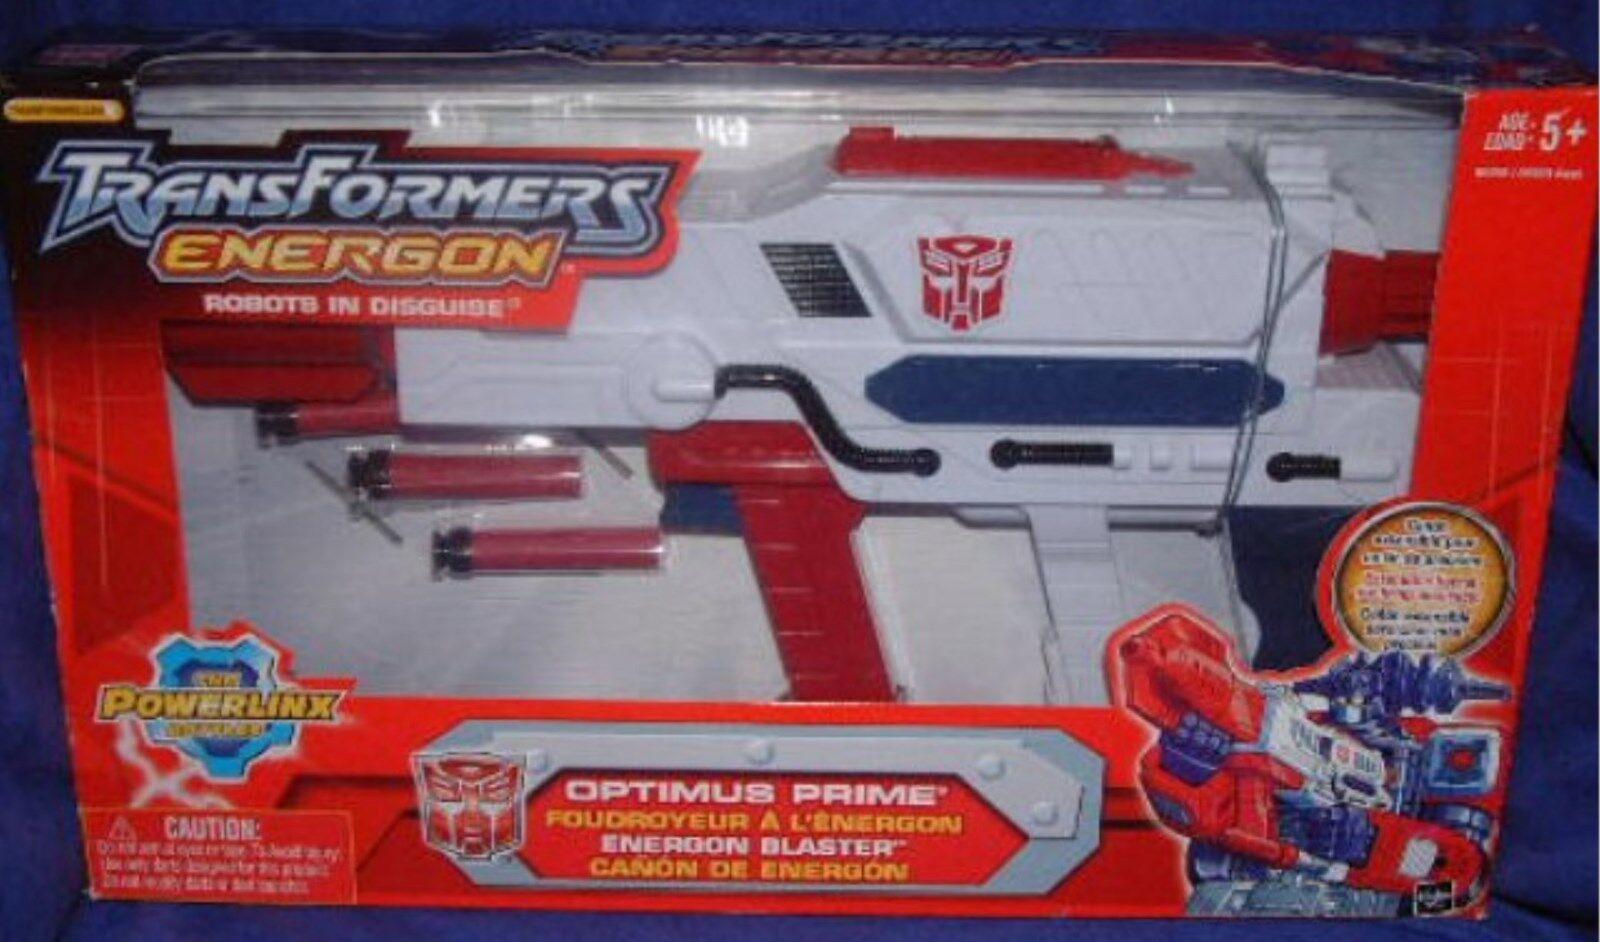 Transformers Energon Optimus Prime Energon Blaster New Powerlinx Factory Sealed